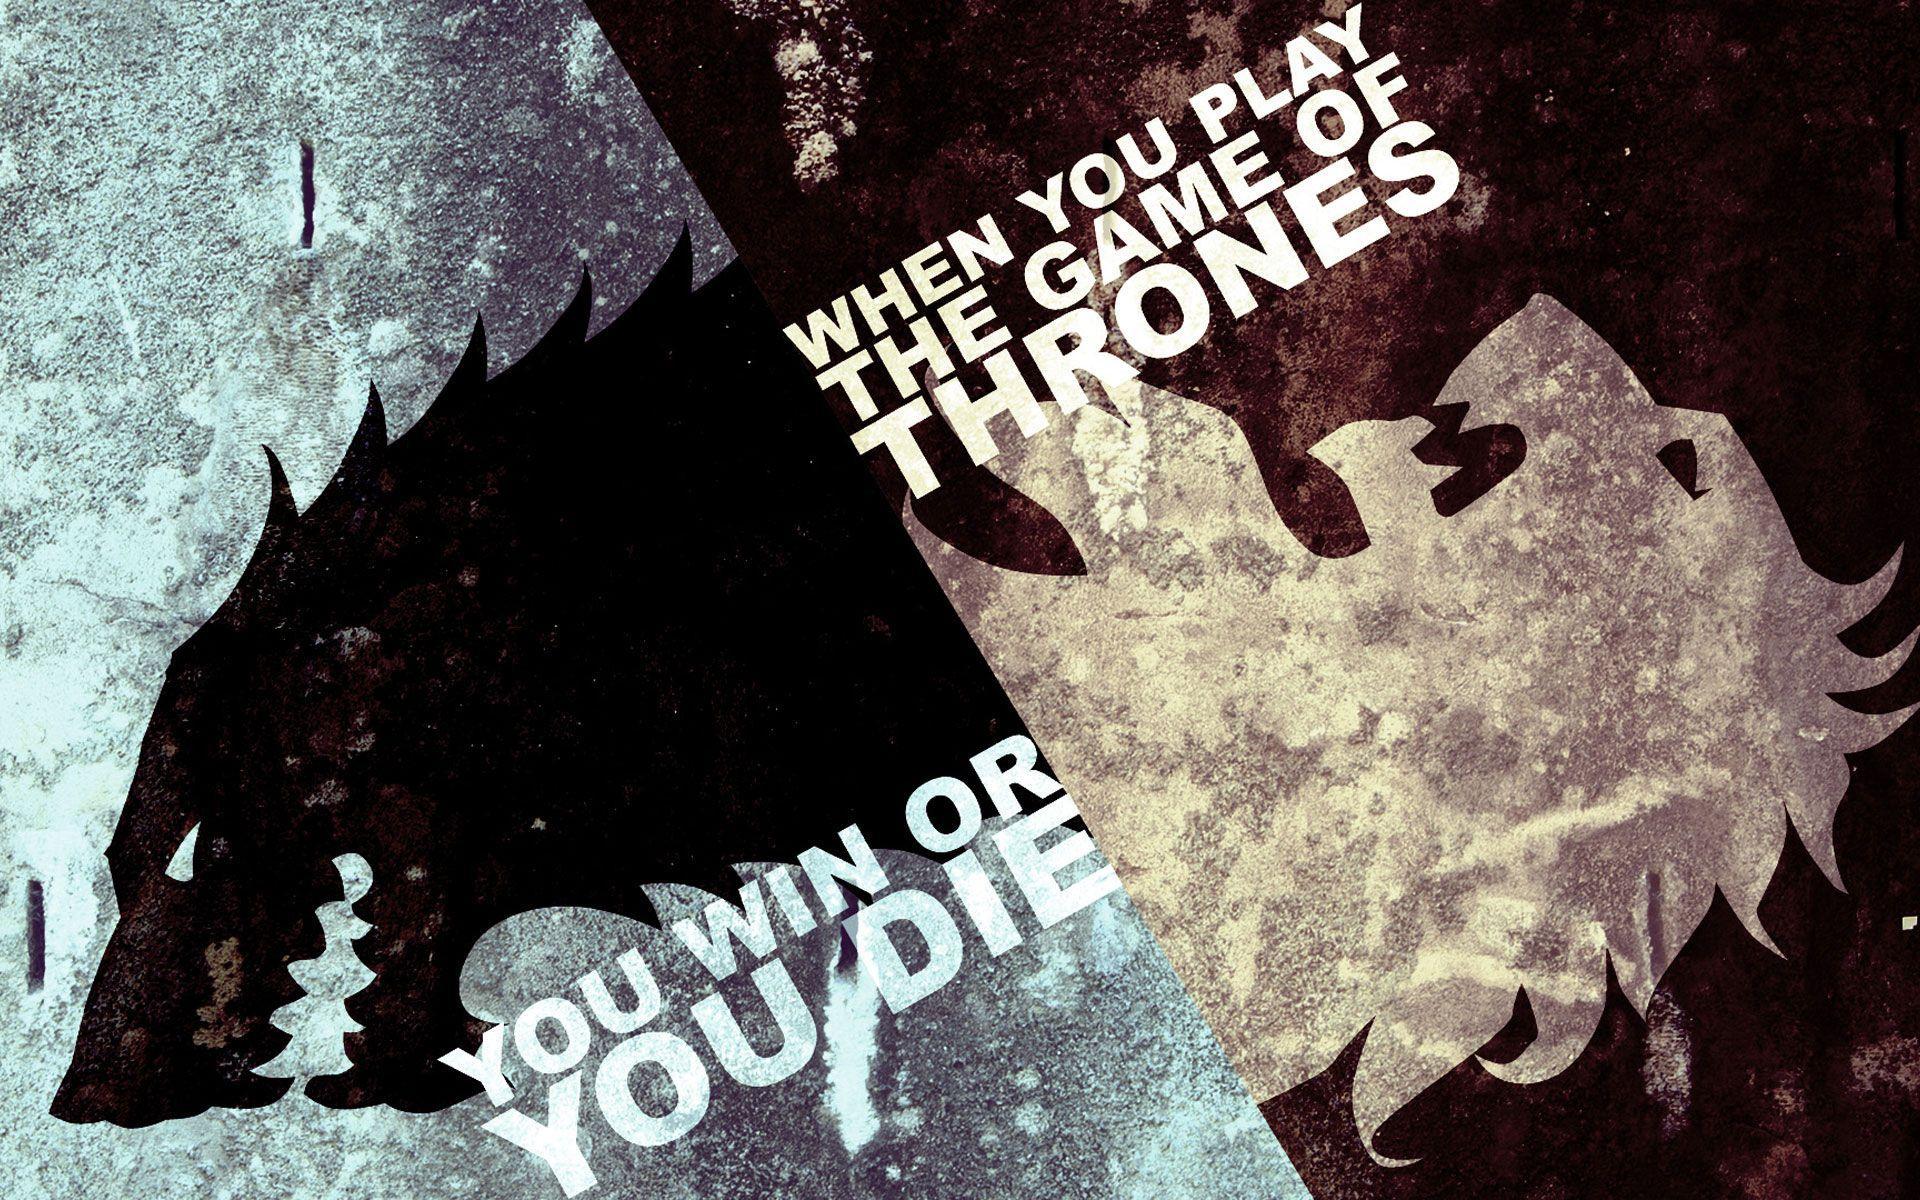 Best Game Of Thrones Wallpapers Top Free Best Game Of Thrones Backgrounds Wallpaperaccess